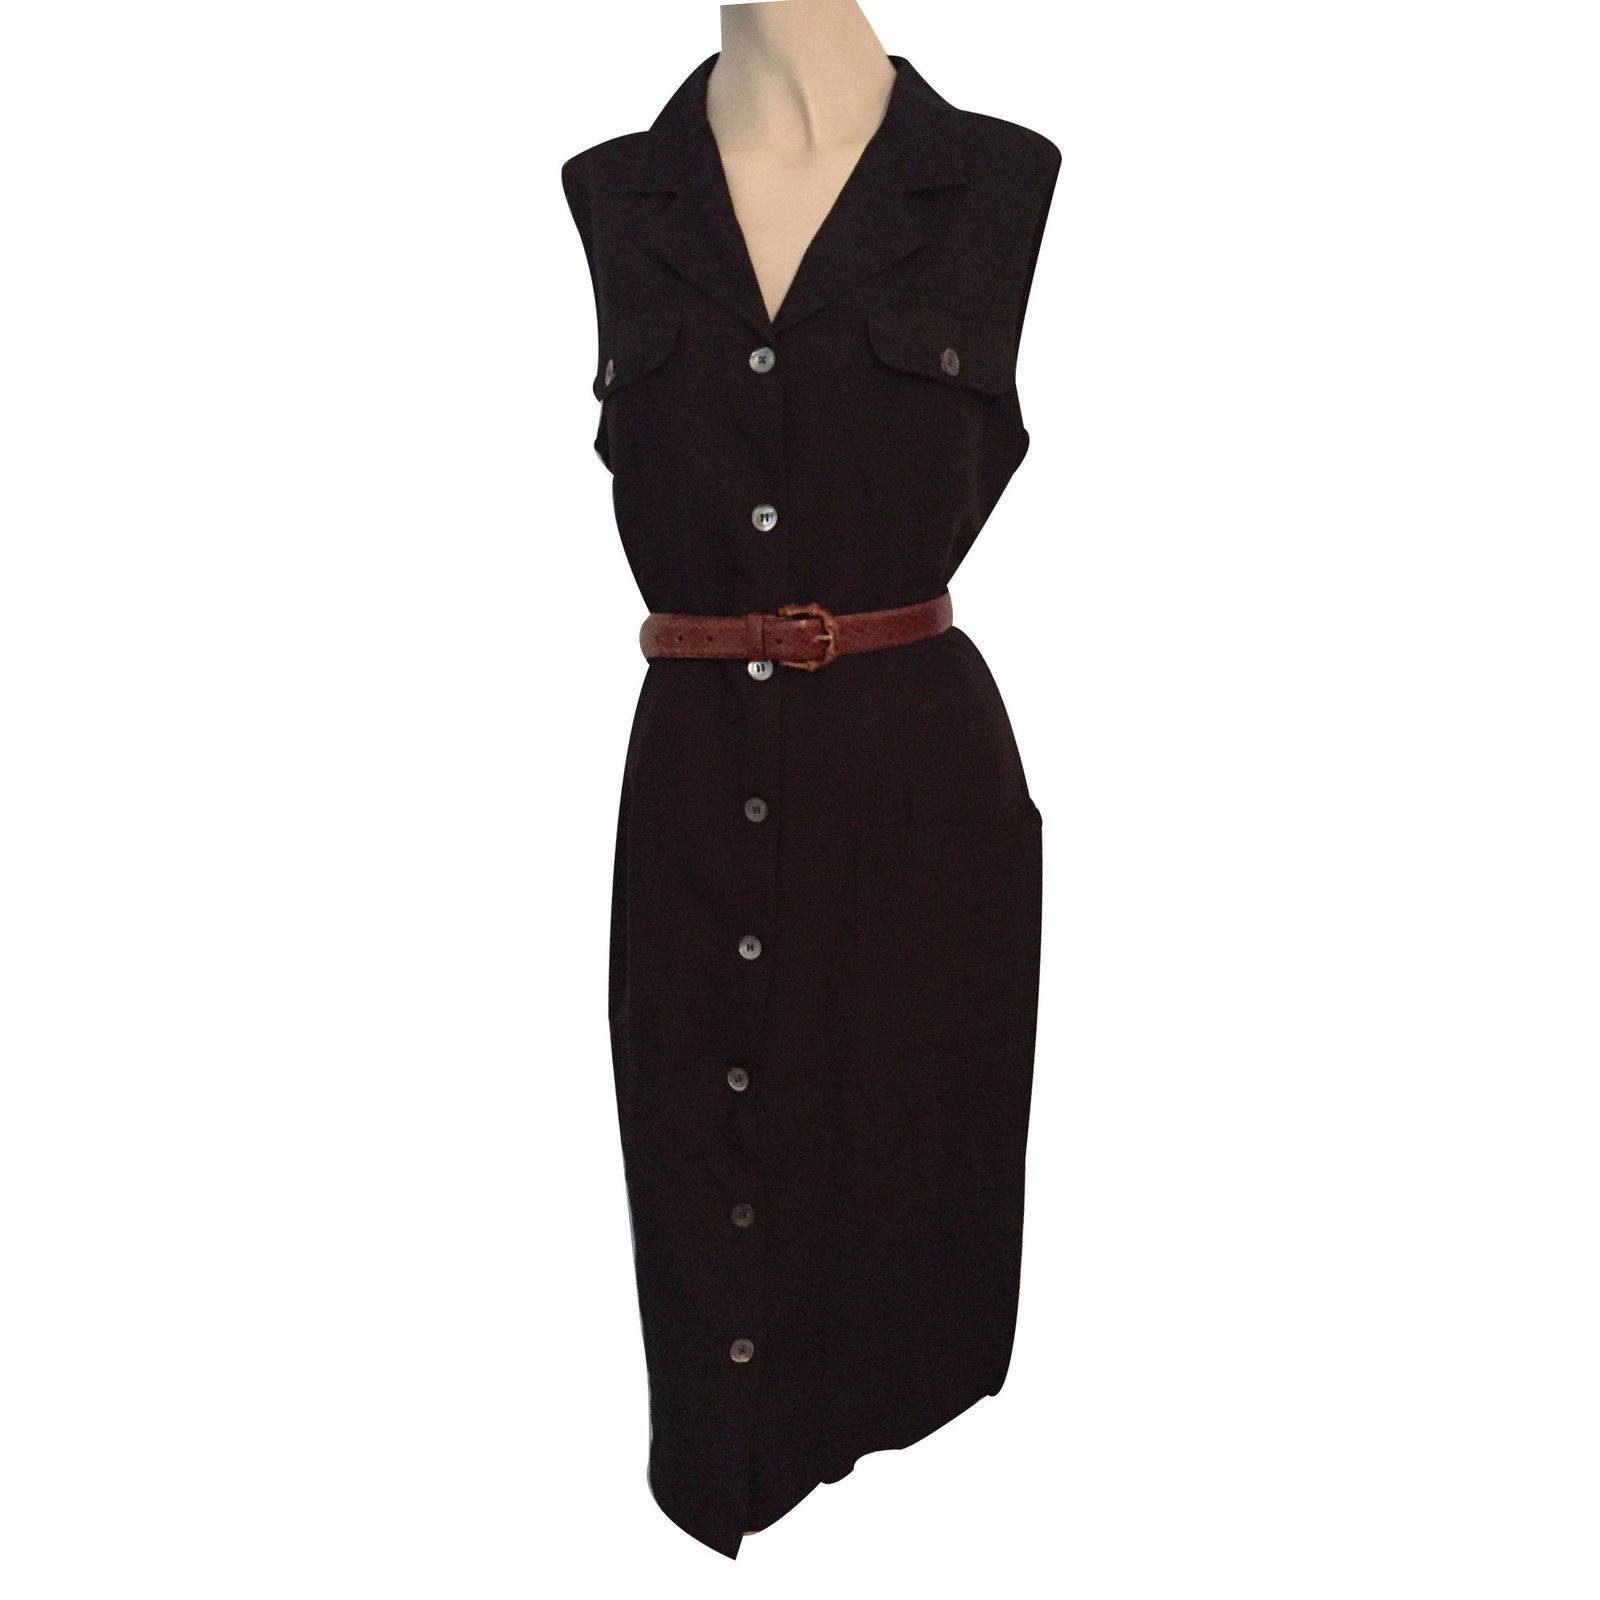 05fb1928de1 Robes Pennyblack Robe Lin Noir ref.15714 - Joli Closet